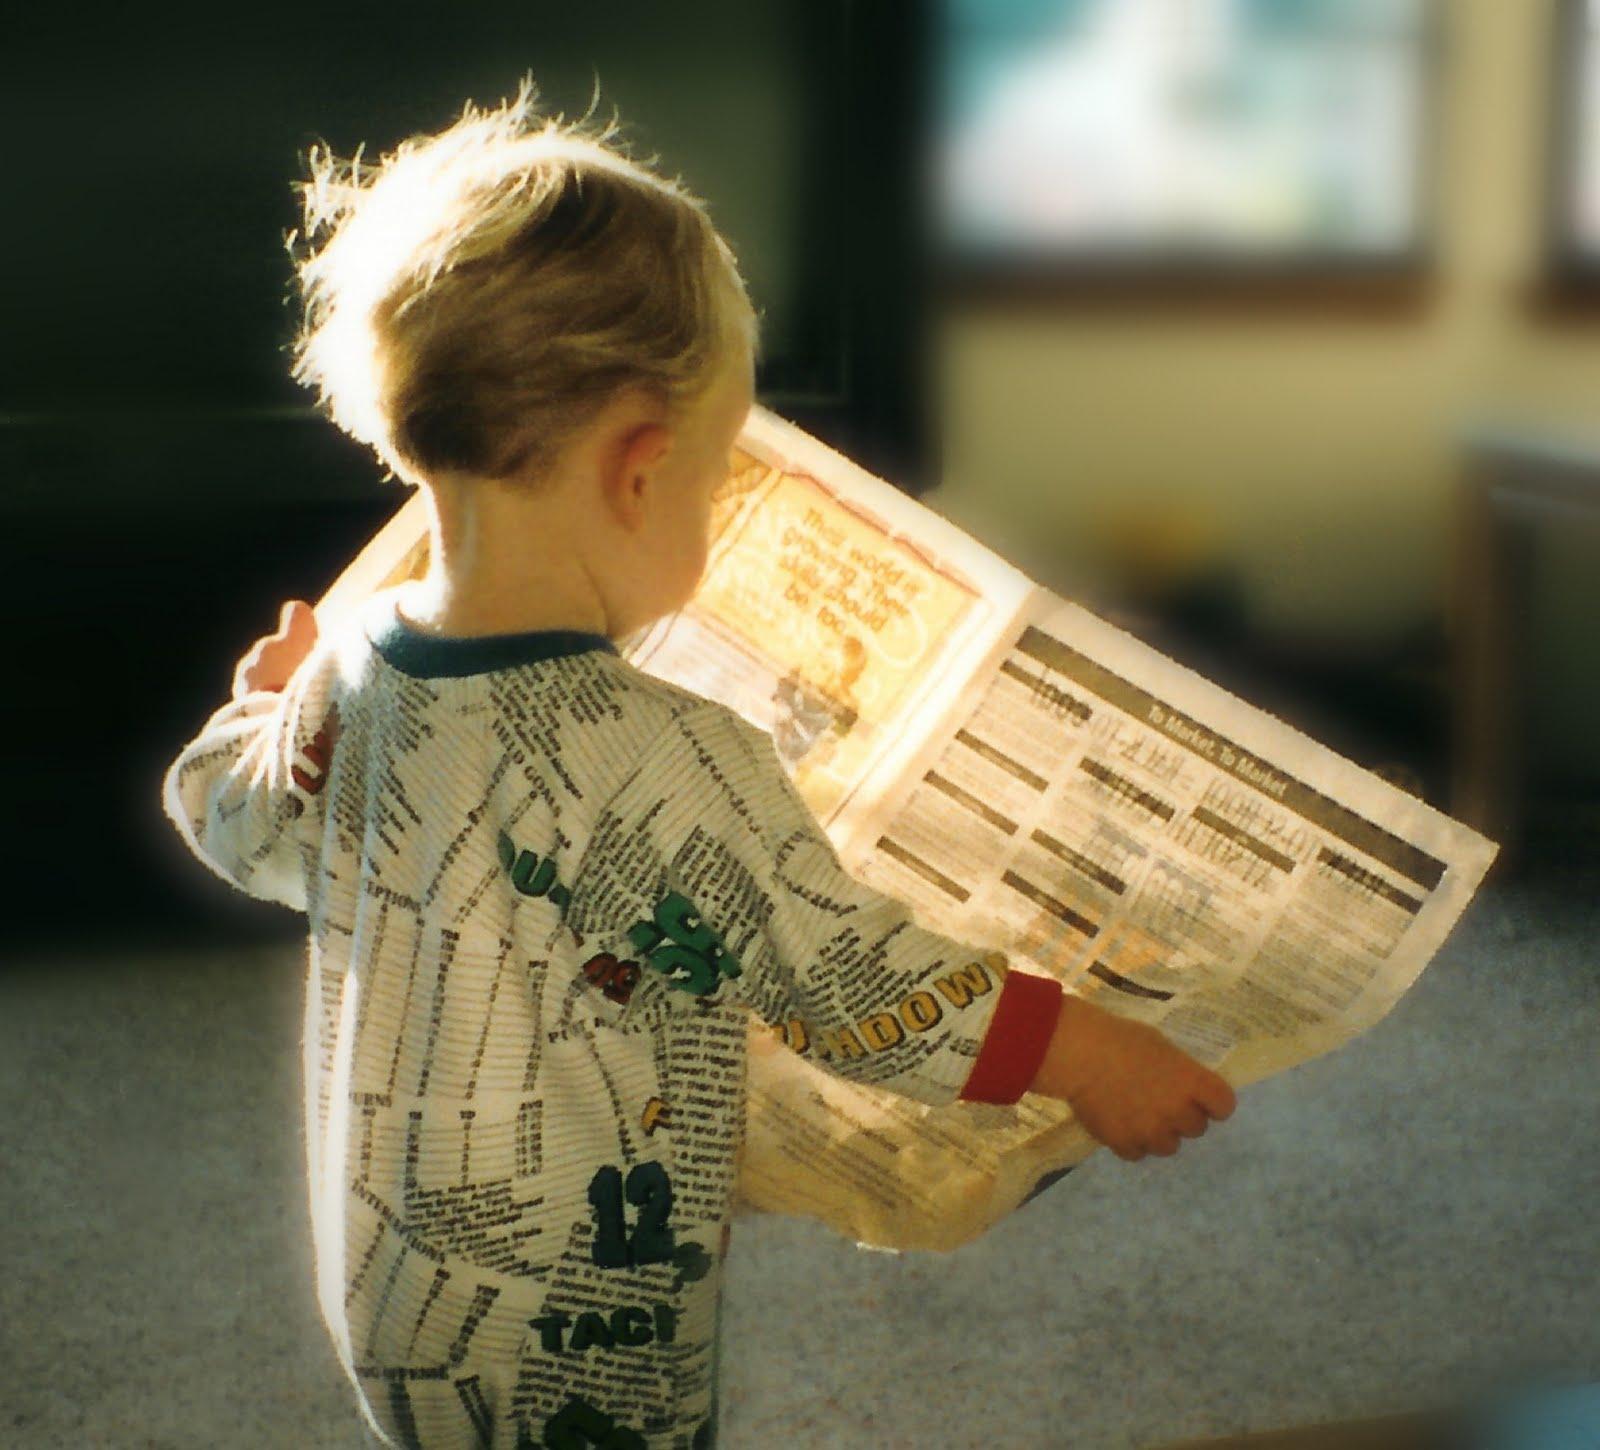 http://3.bp.blogspot.com/-h7Hr857Pw8k/Te2CrB_Kv4I/AAAAAAAAAMo/p_ZgG4nGmLQ/s1600/kid_reading_newspaper+natglam.jpg